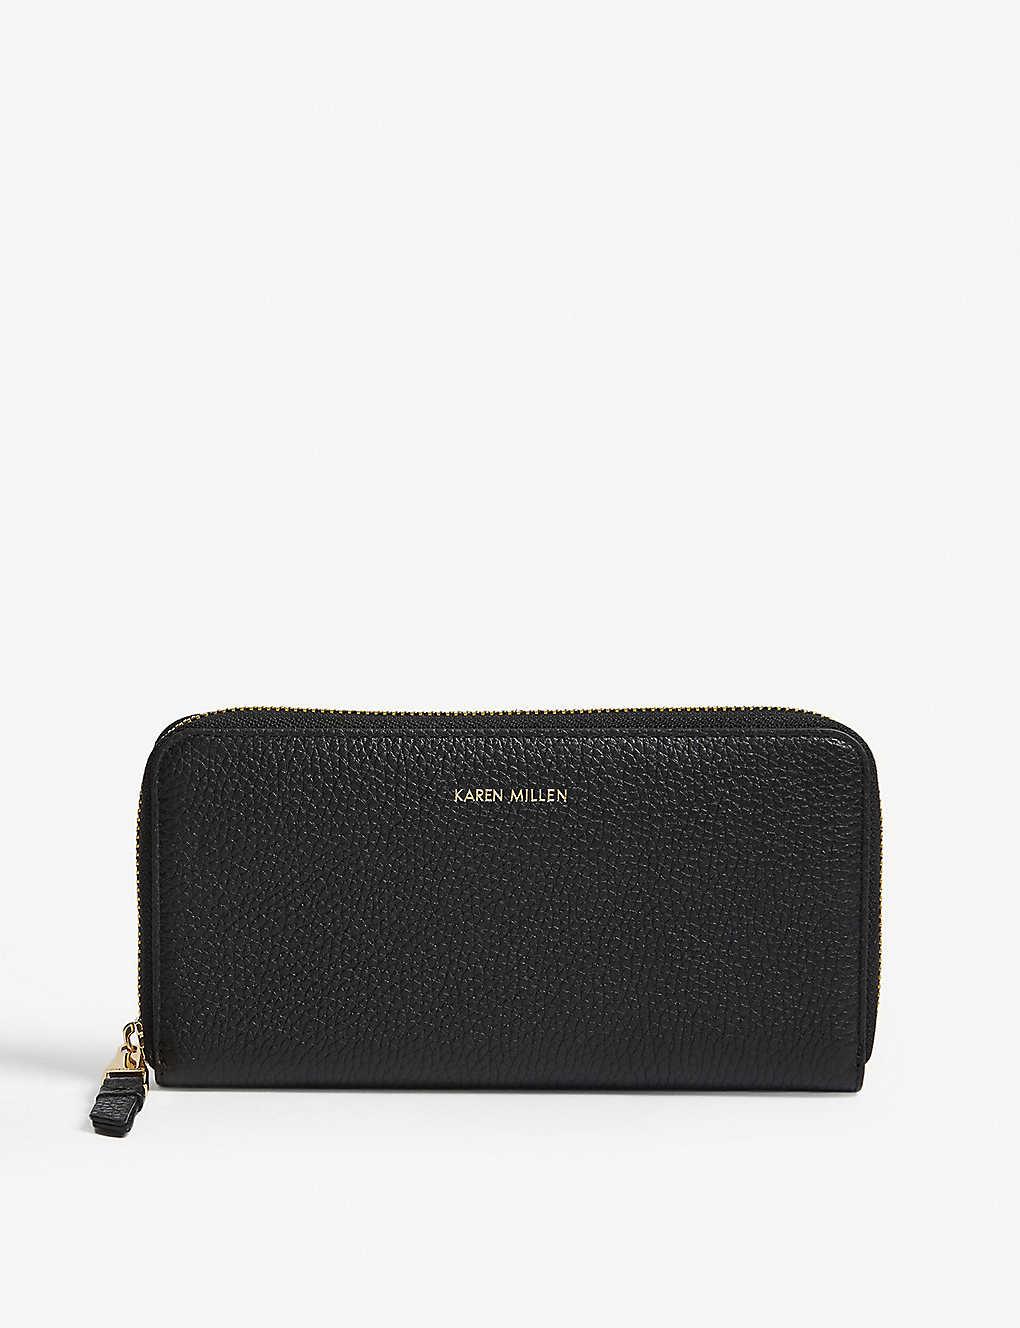 0b4ba04b8f5 KAREN MILLEN - Logo zip-around leather purse | Selfridges.com